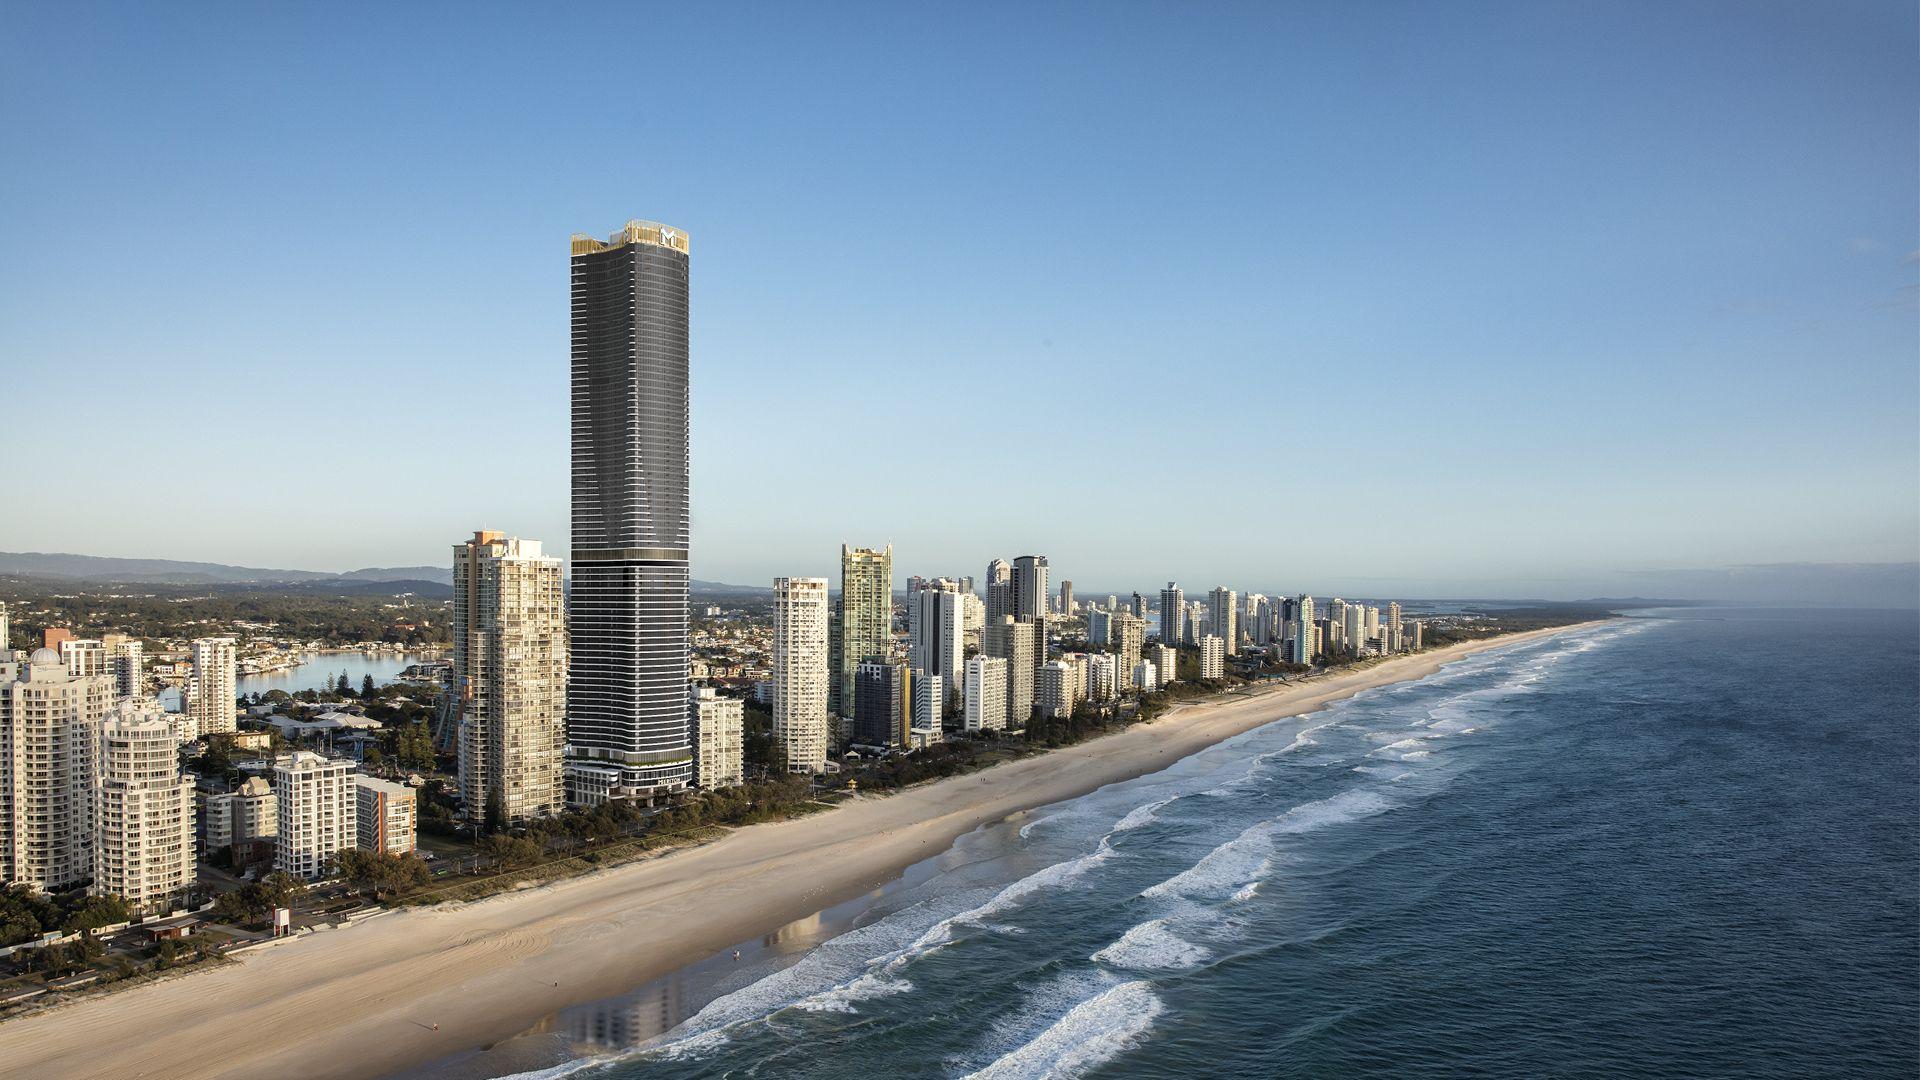 84 The Esplanade, Surfers Paradise, QLD 4217, Image 0